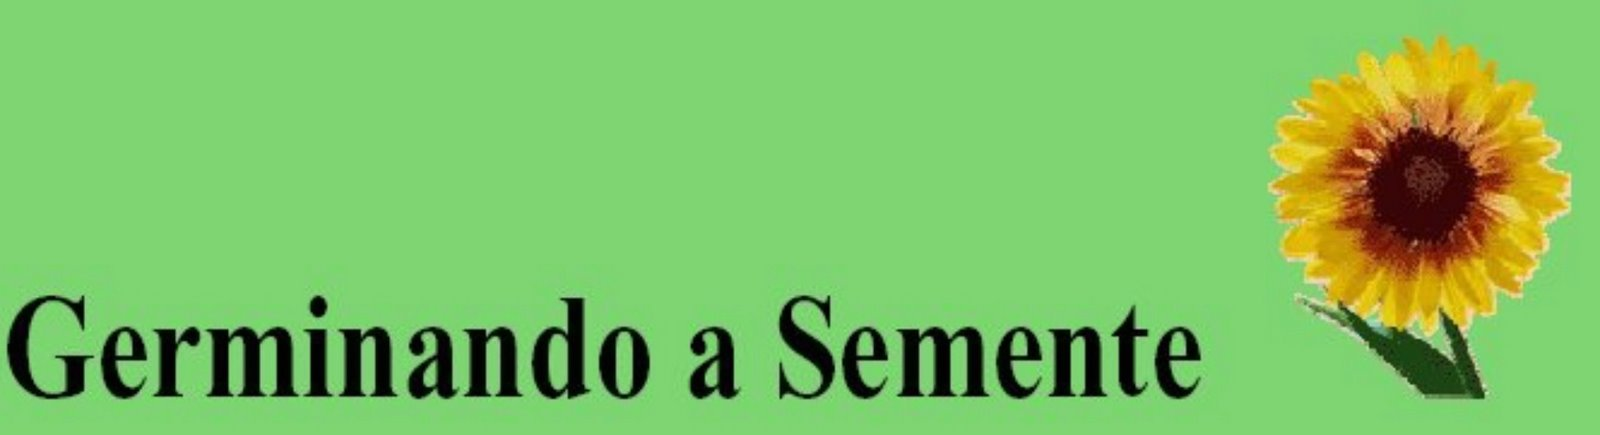 GERMINANDO A SEMENTE